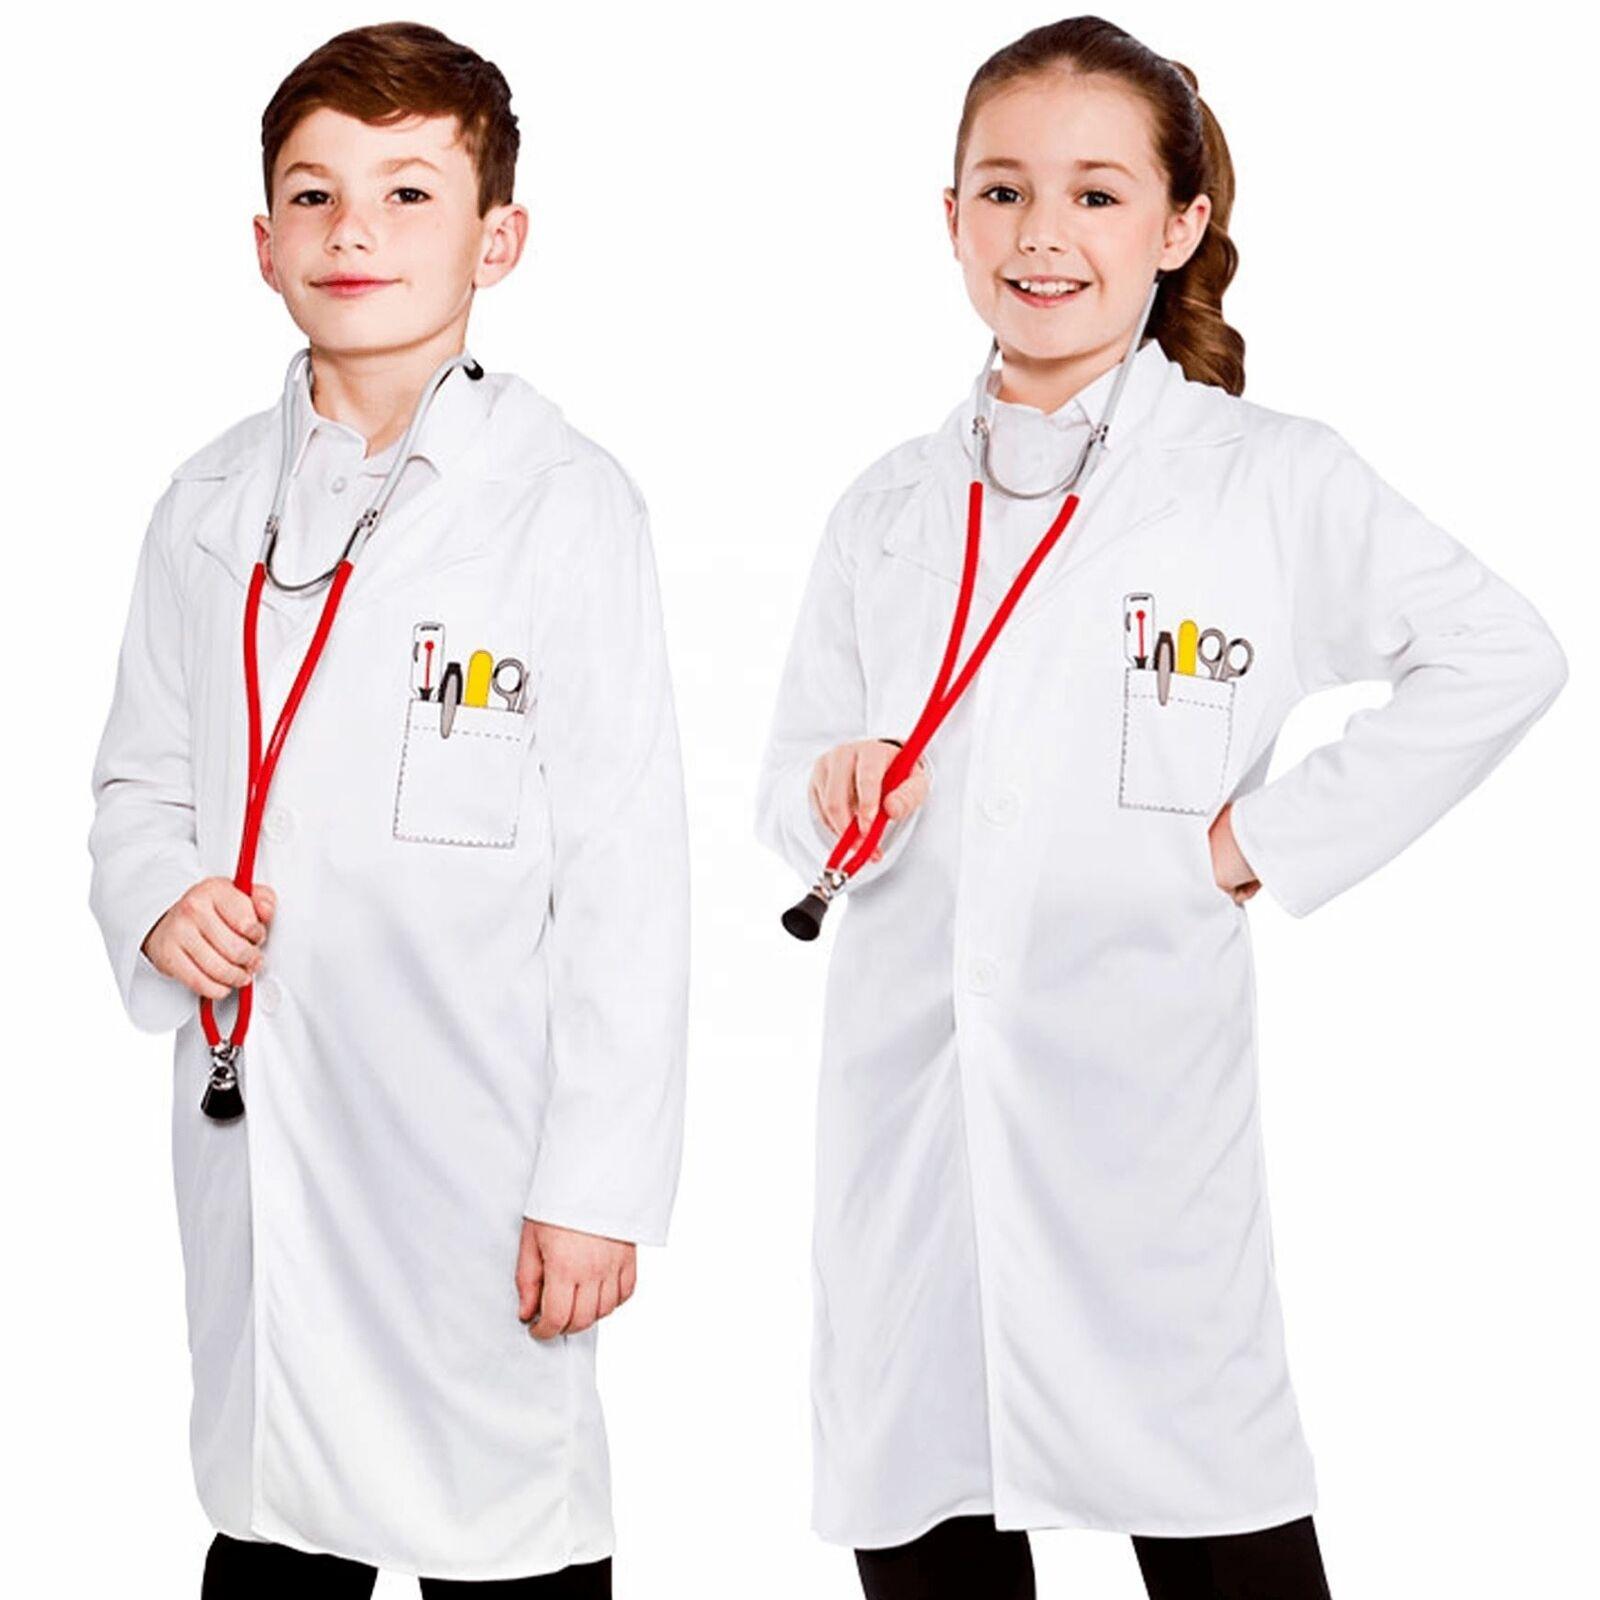 Dr Lab Coat Costume Halloween Fancy Dress